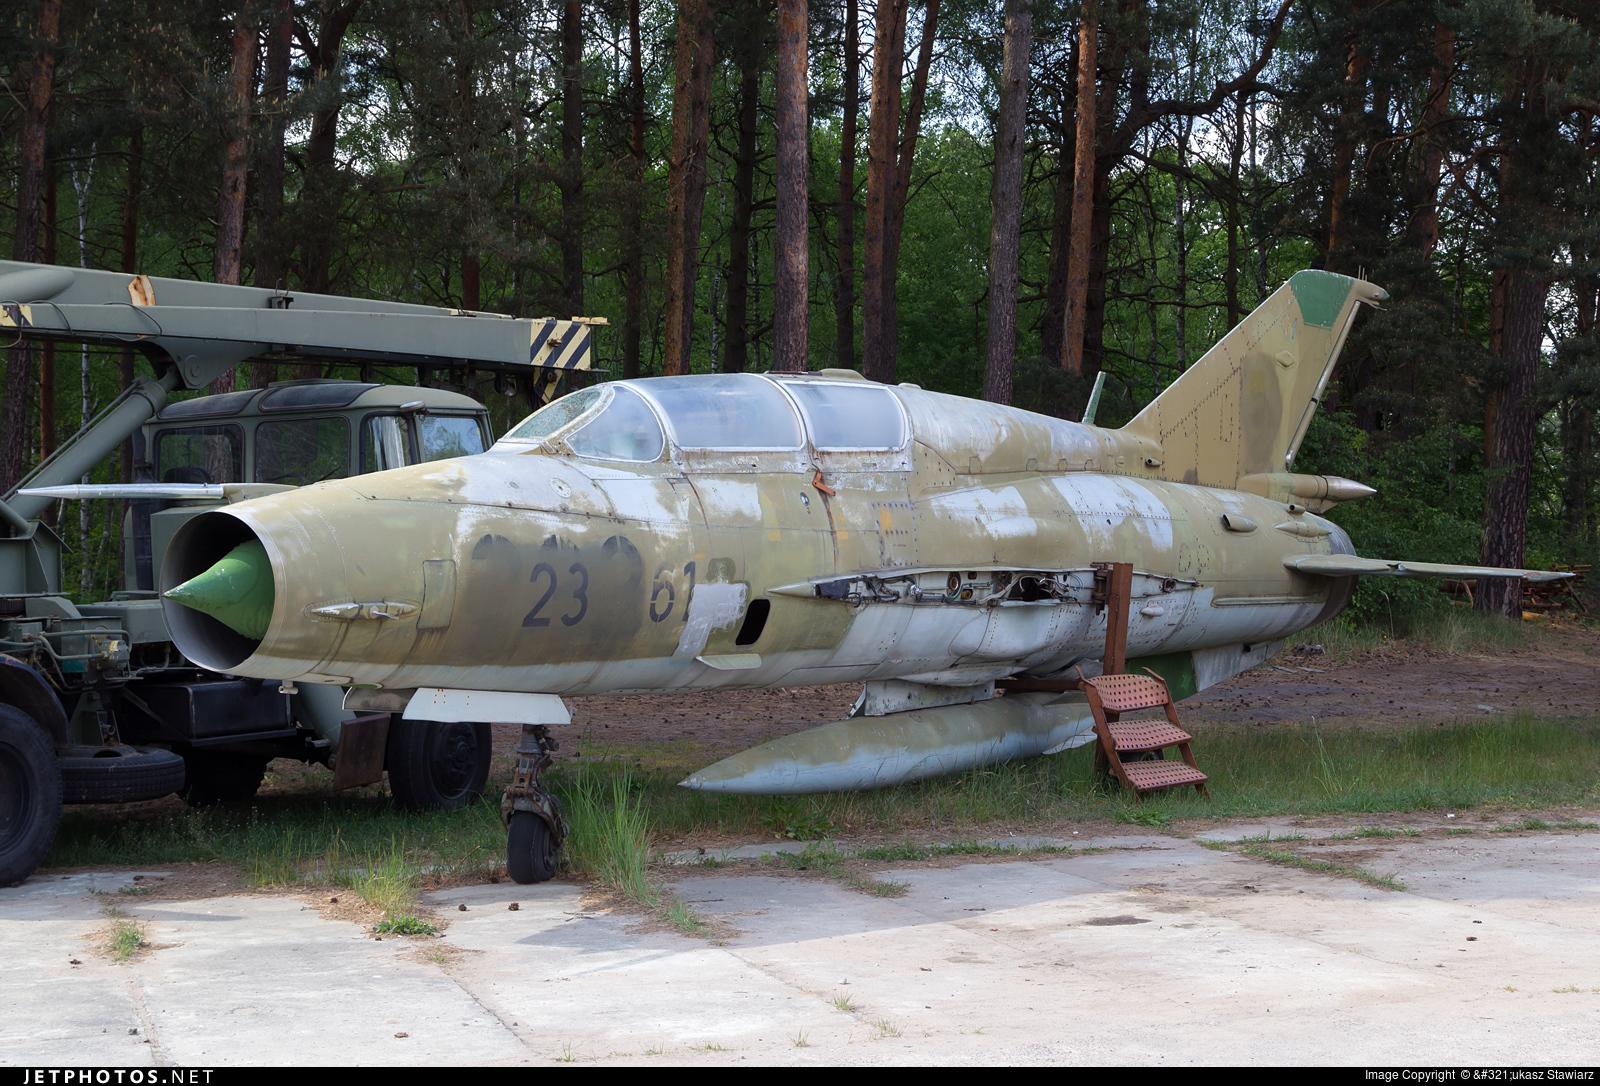 23-61 - Mikoyan-Gurevich MiG-21UM Mongol B - Germany - Air Force